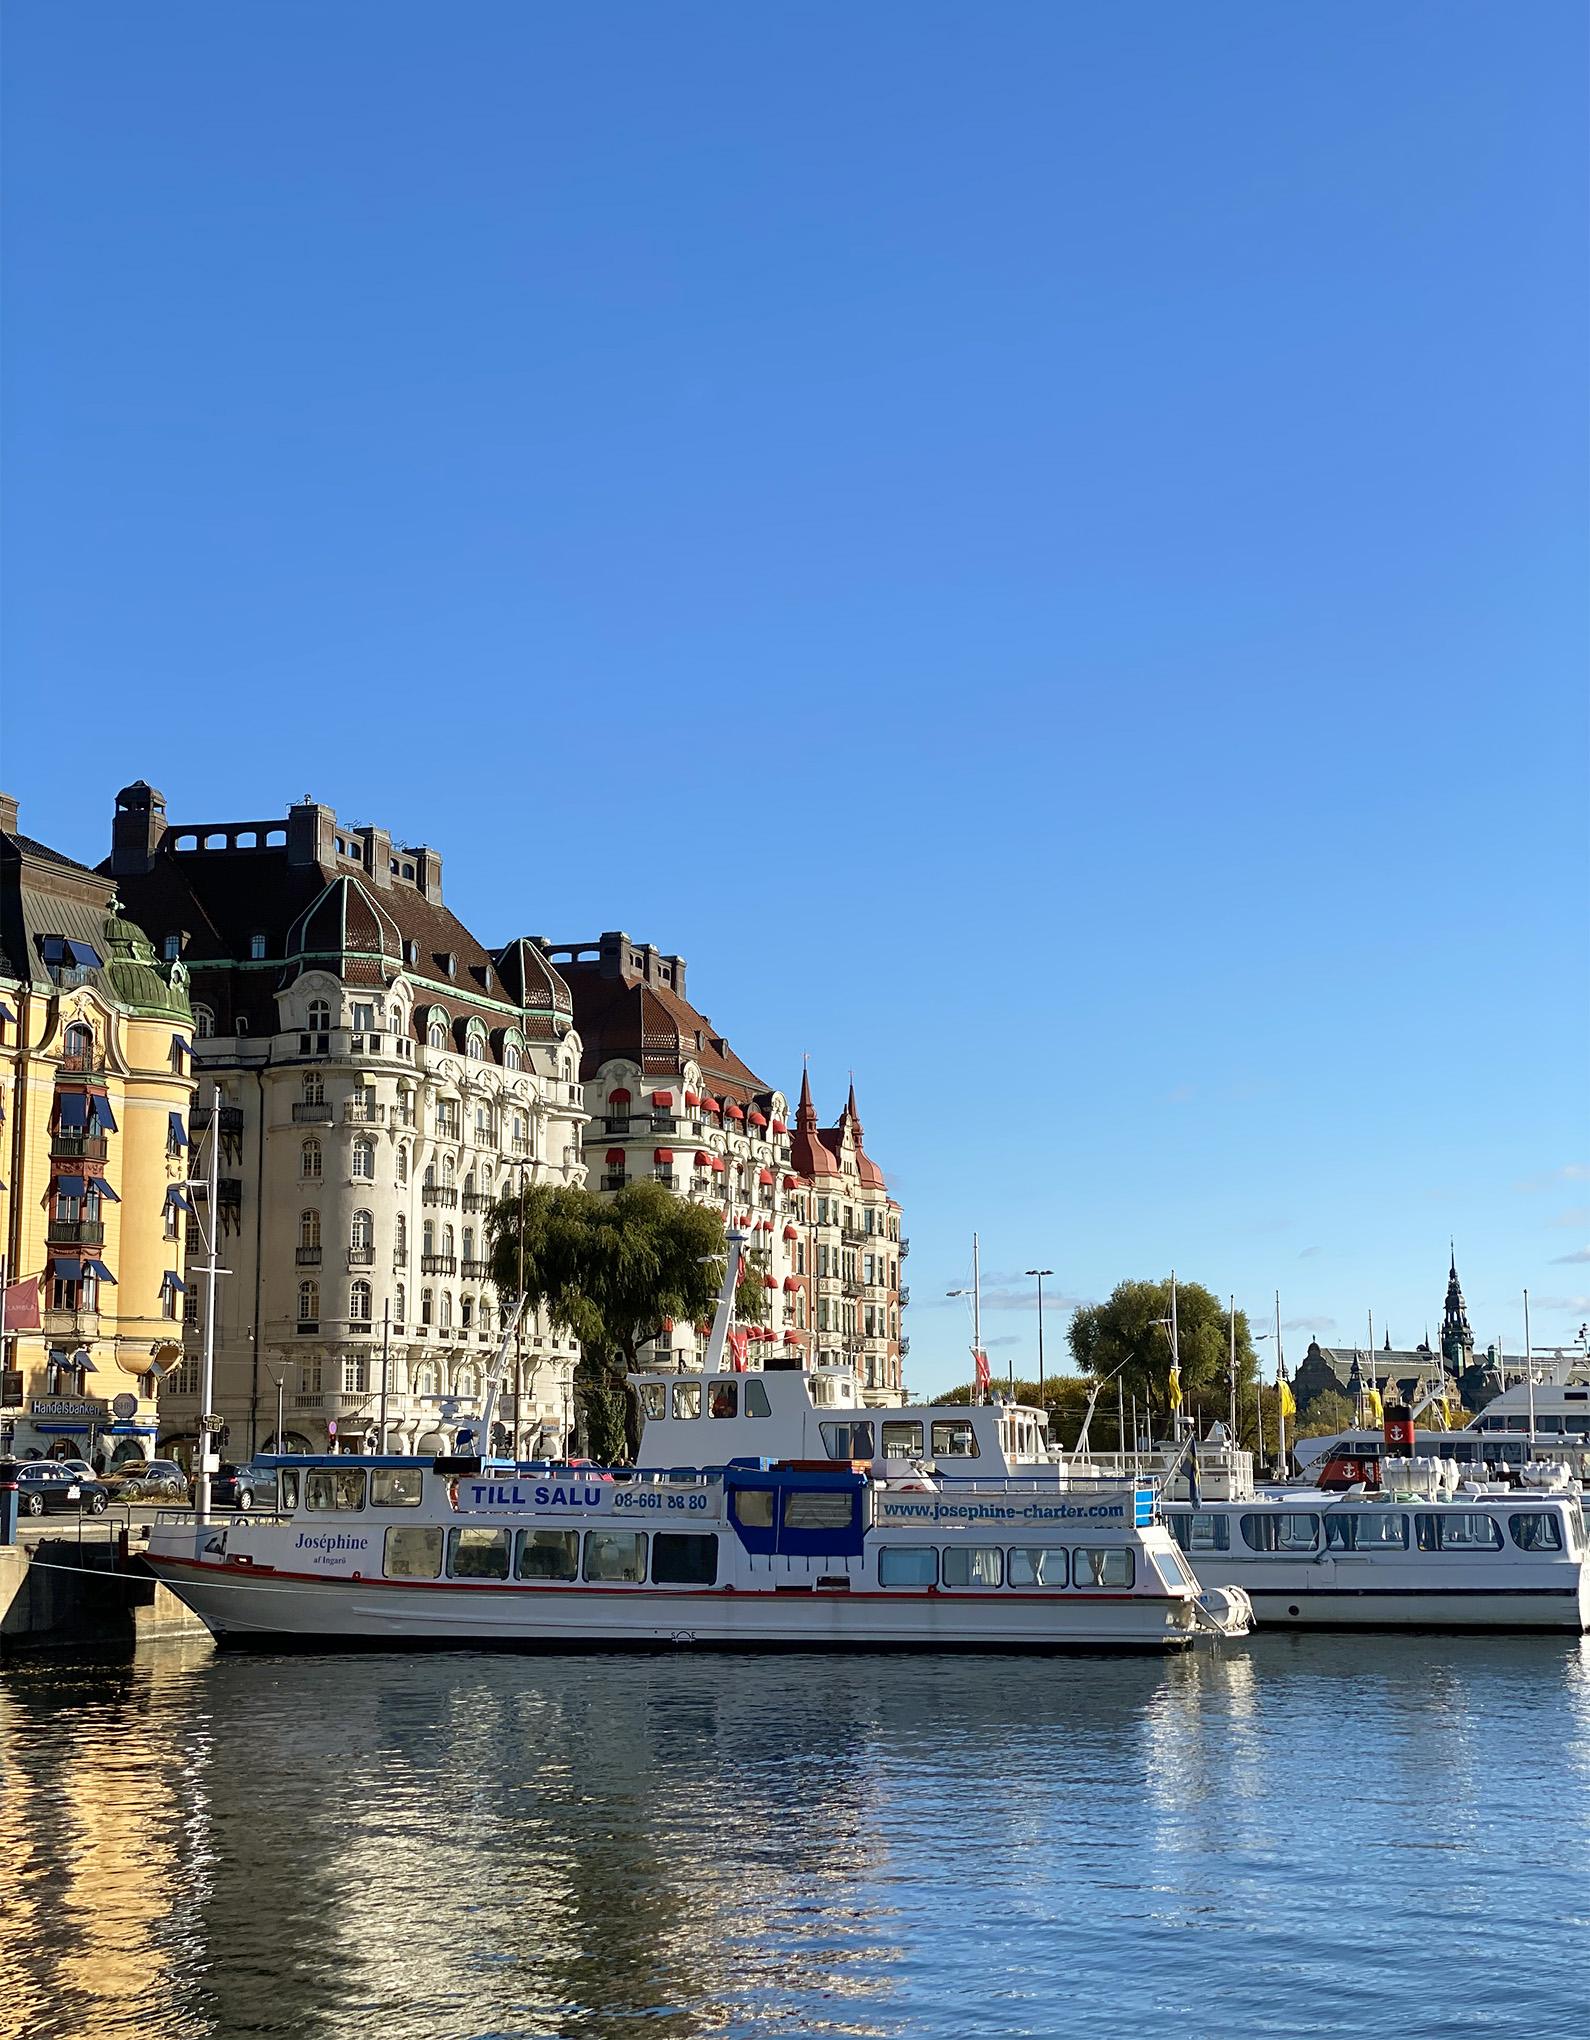 Façade of the Lydmar Hotel in Stockholm